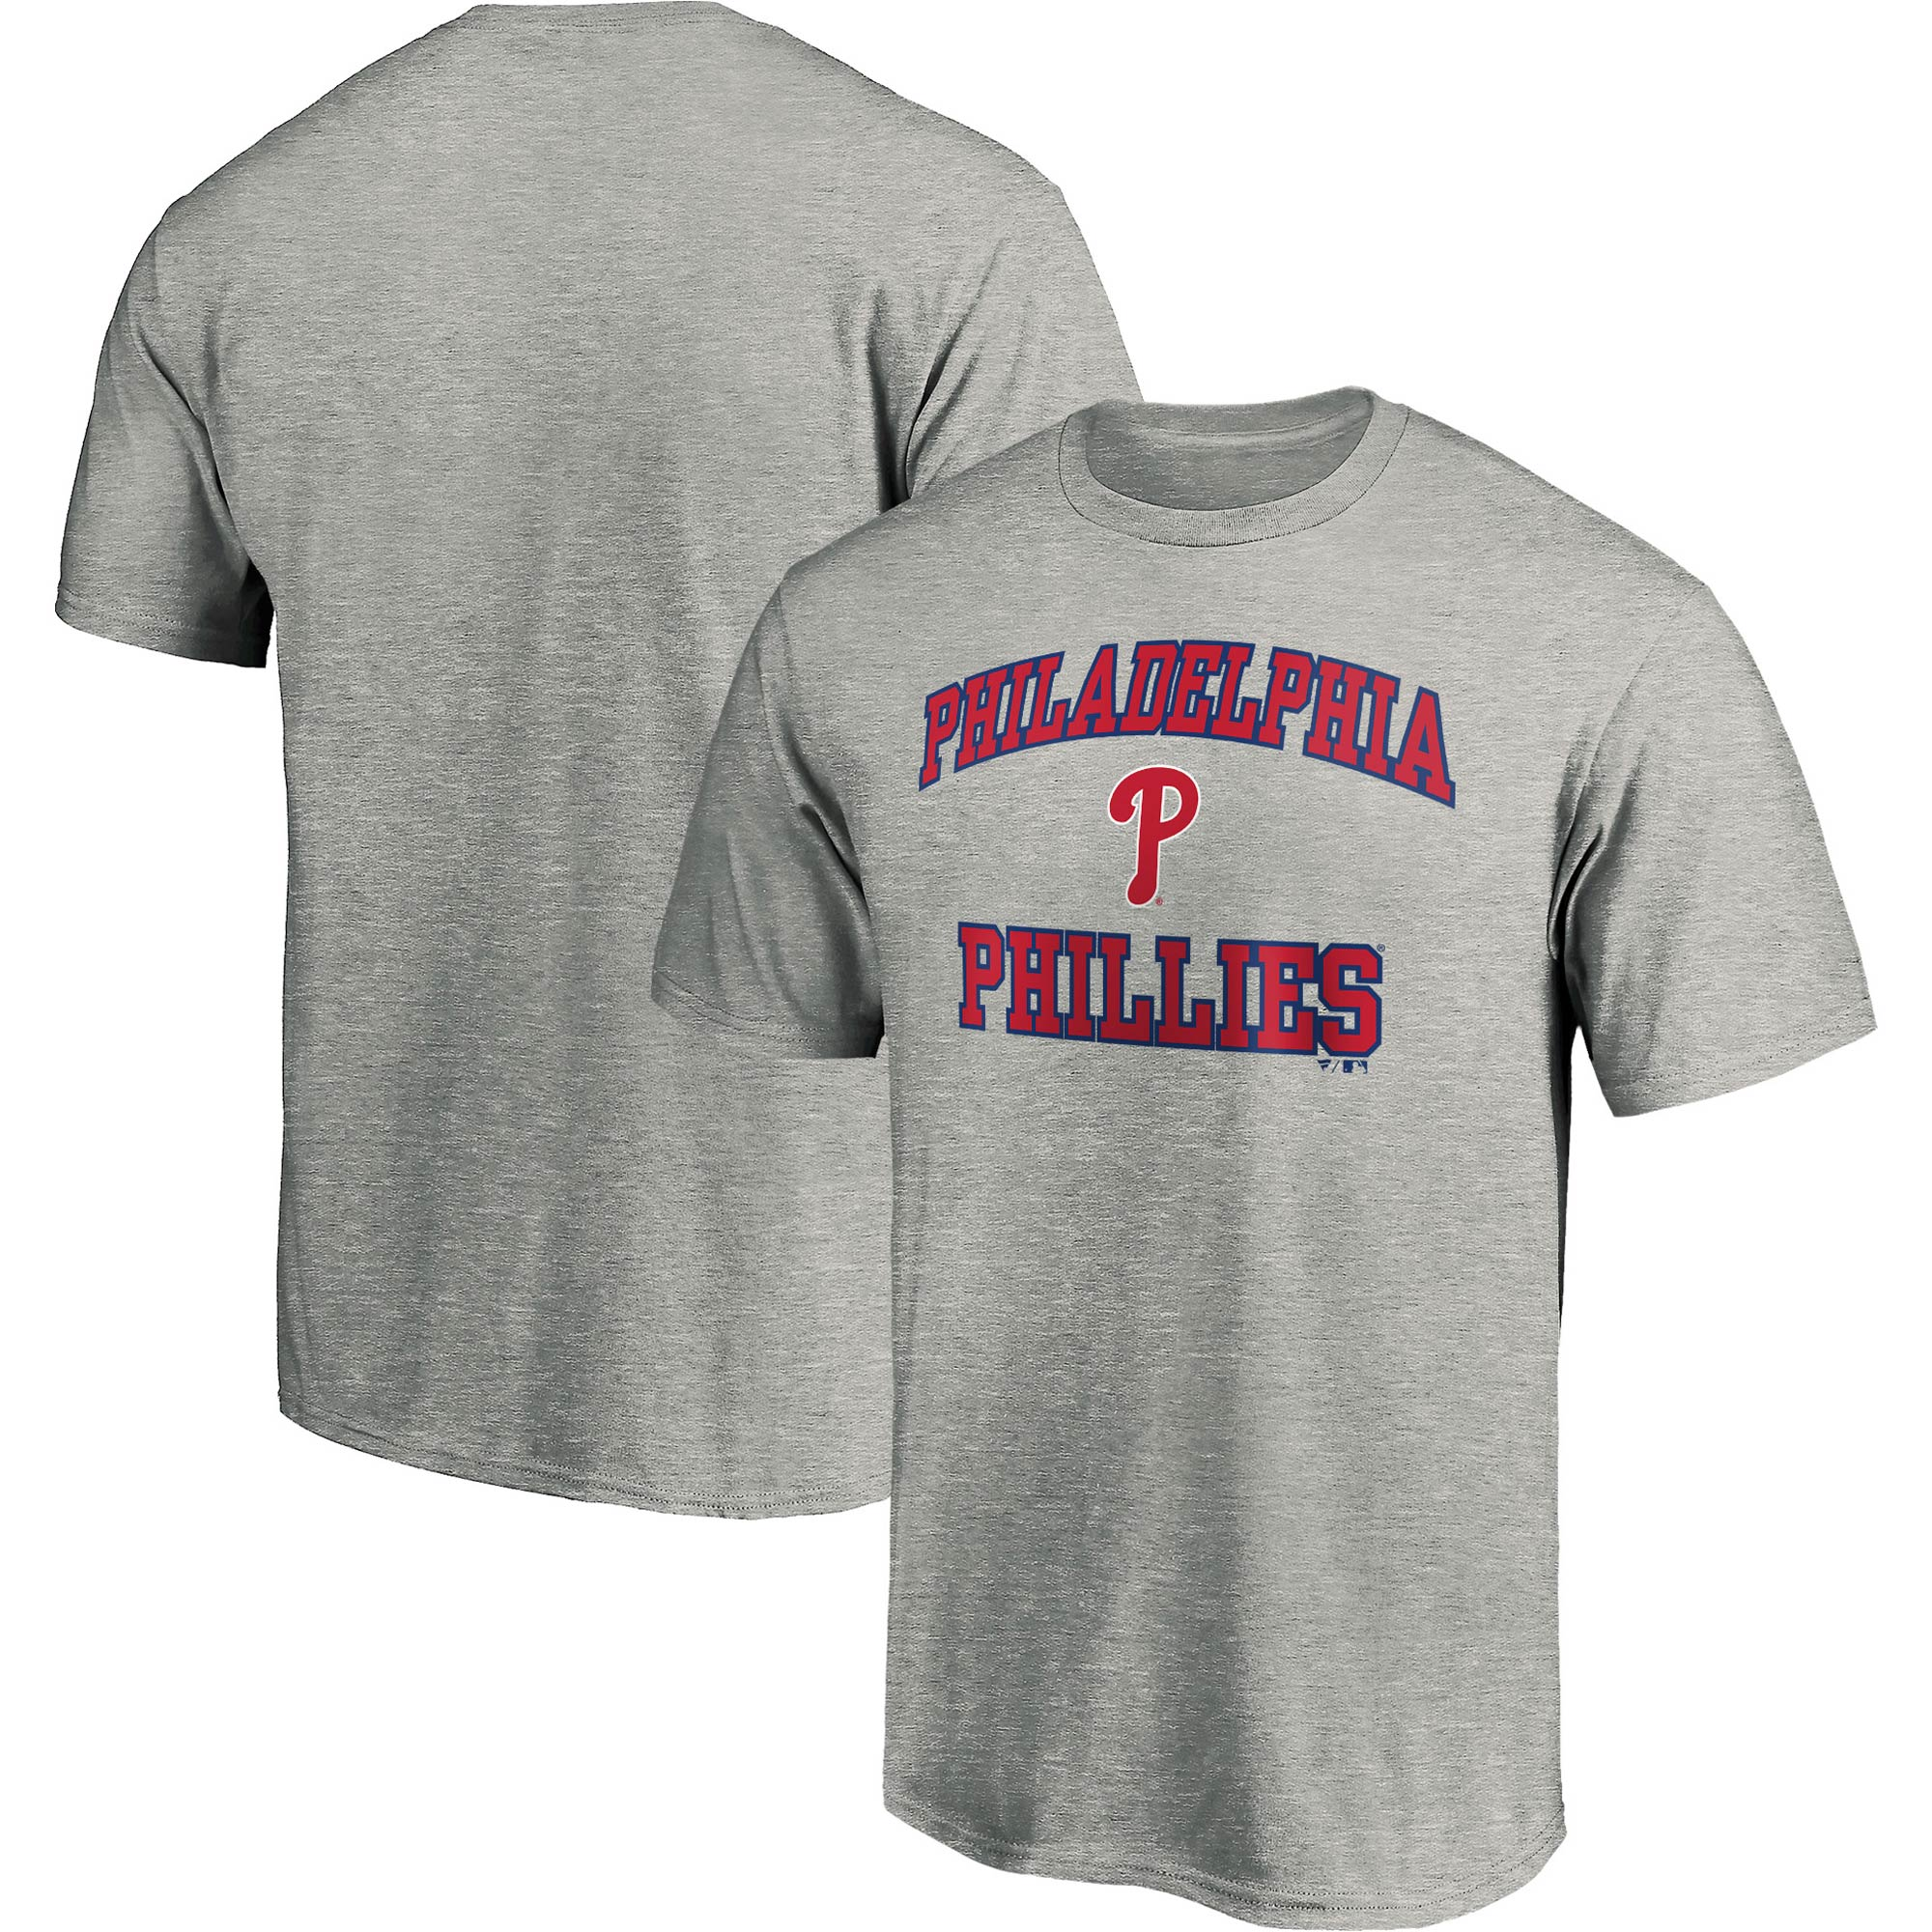 Philadelphia Phillies Fanatics Branded Heart & Soul T-Shirt - Heathered Gray